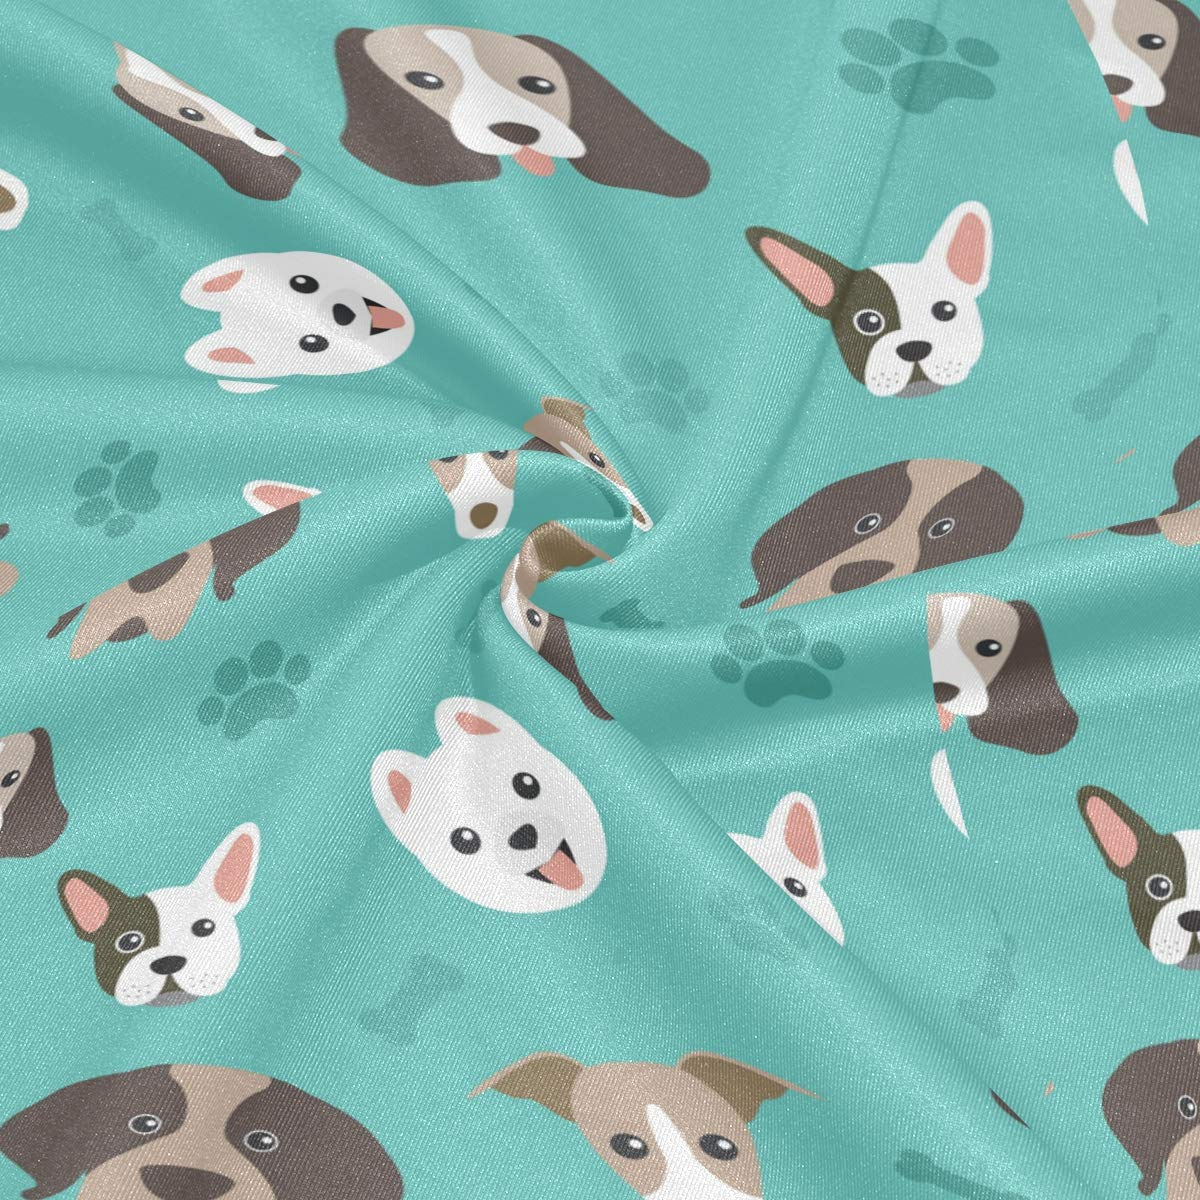 Arilce Dog Pattern Collection,3D Pattern Sweaters Fashion Hoodies Sweatshirts Unisex,Men Women Boy Girl Kid Youth